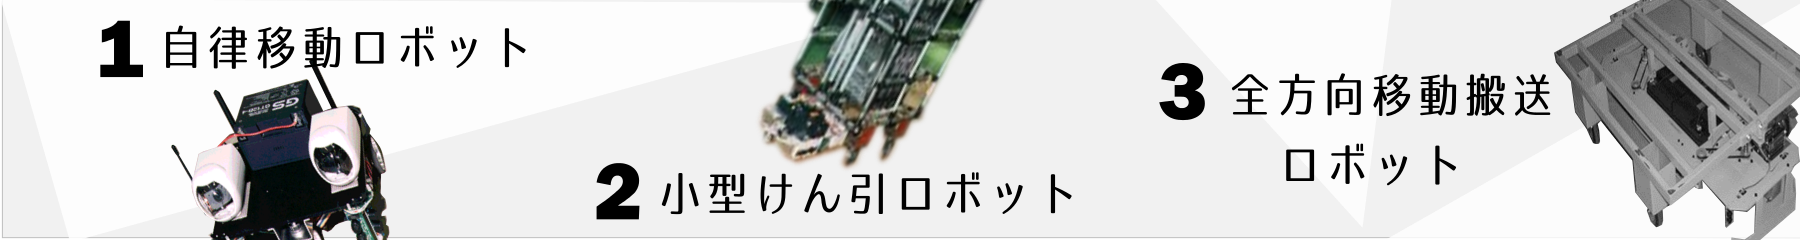 aistxjsd10_smallrobot3type